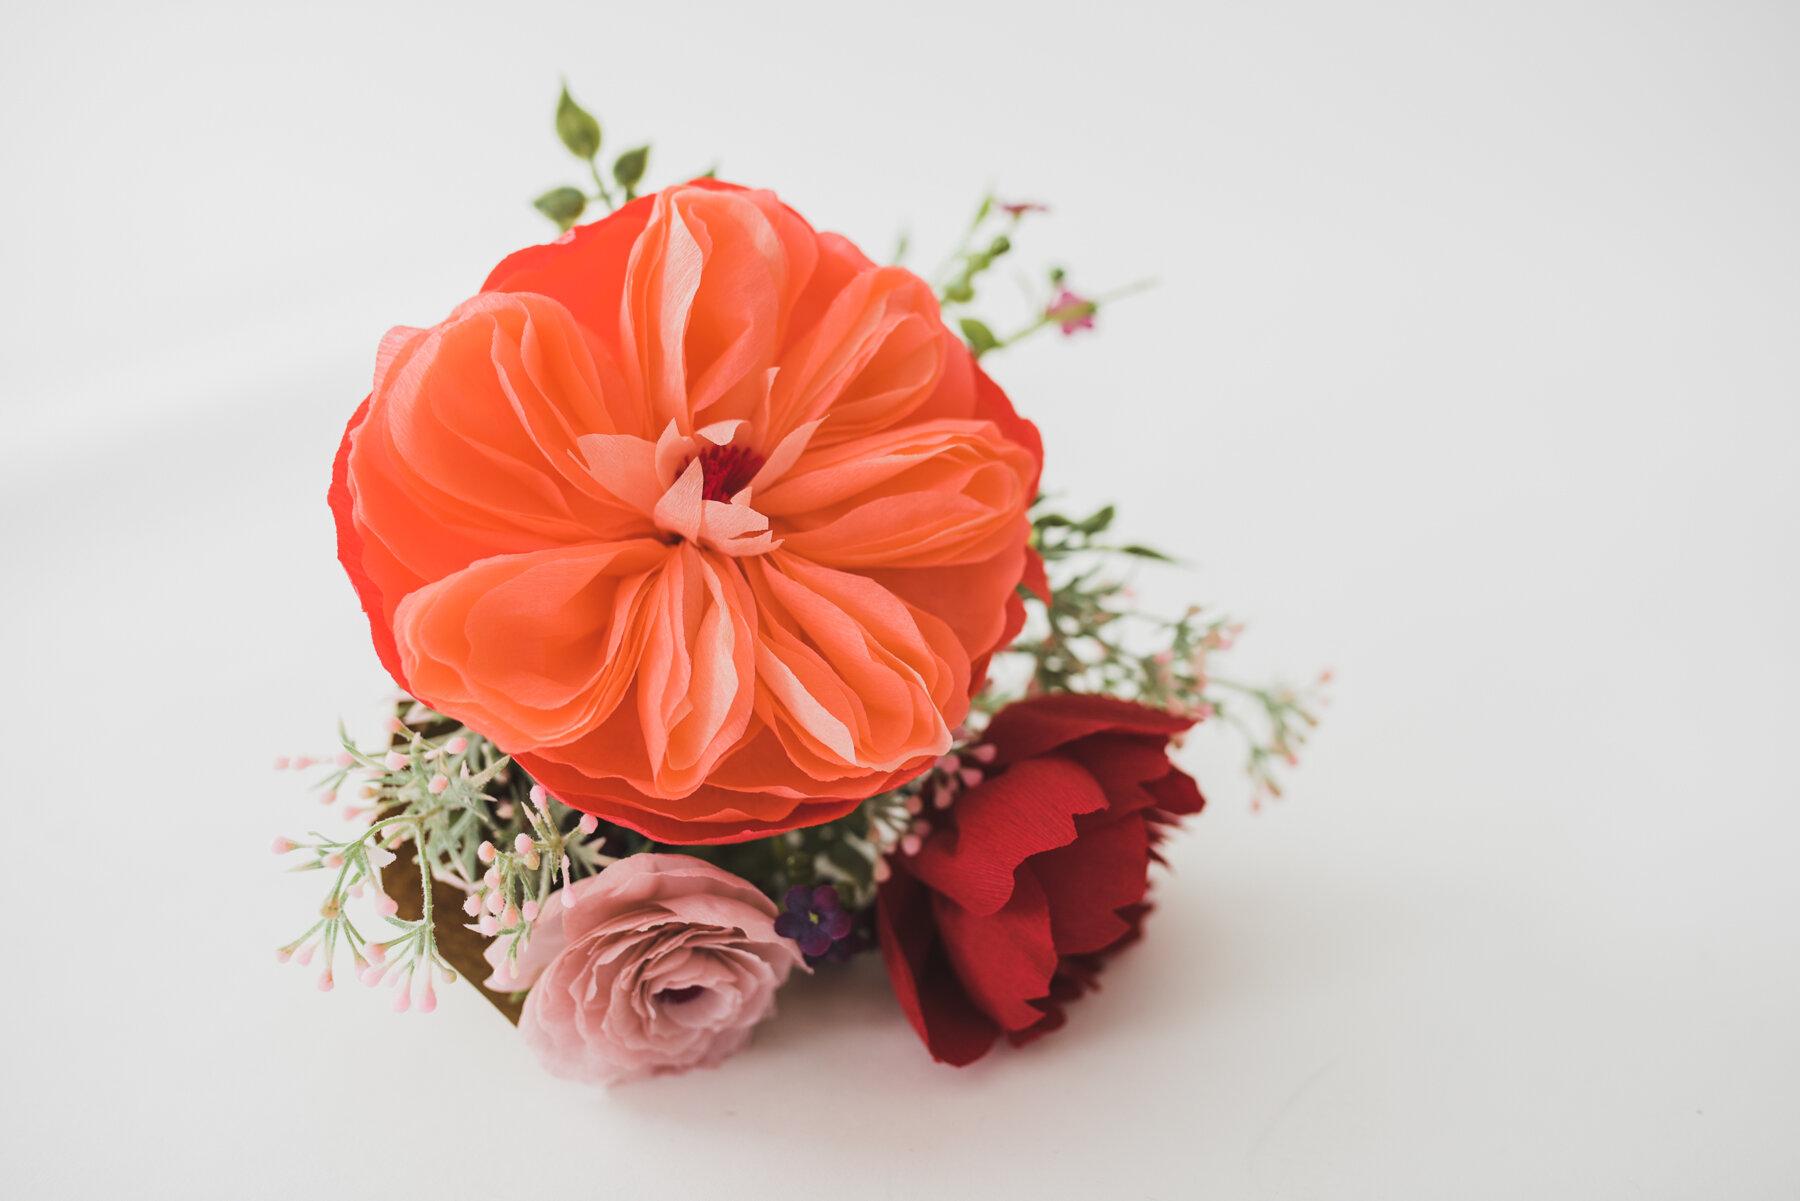 Seasonal Bouquets - From $55